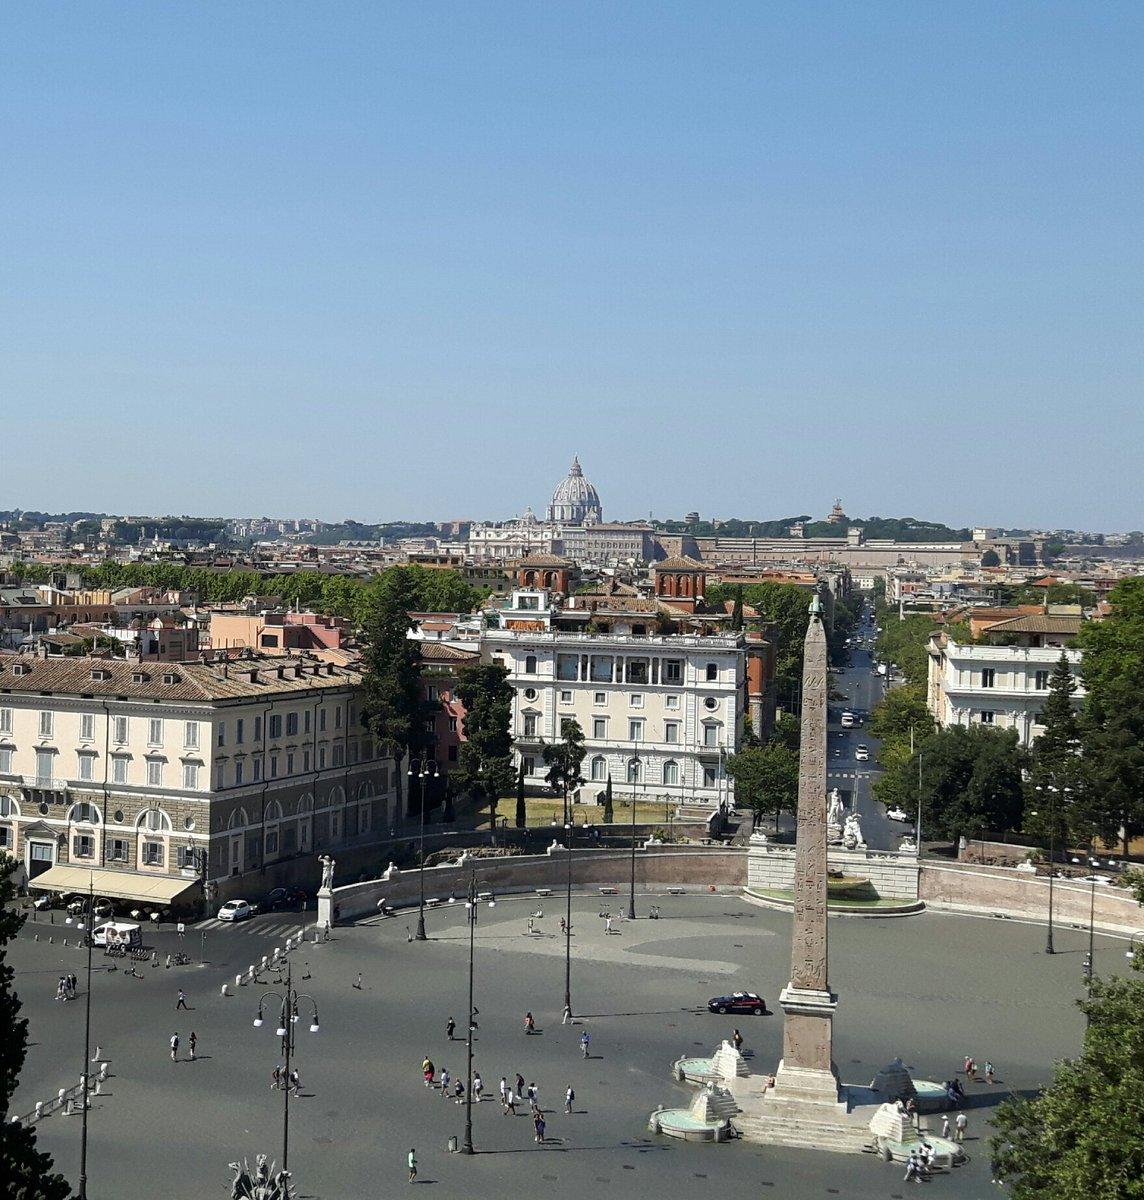 I missed you sooooo much!  #Roma #Romepic.twitter.com/UeHQnGmneJ